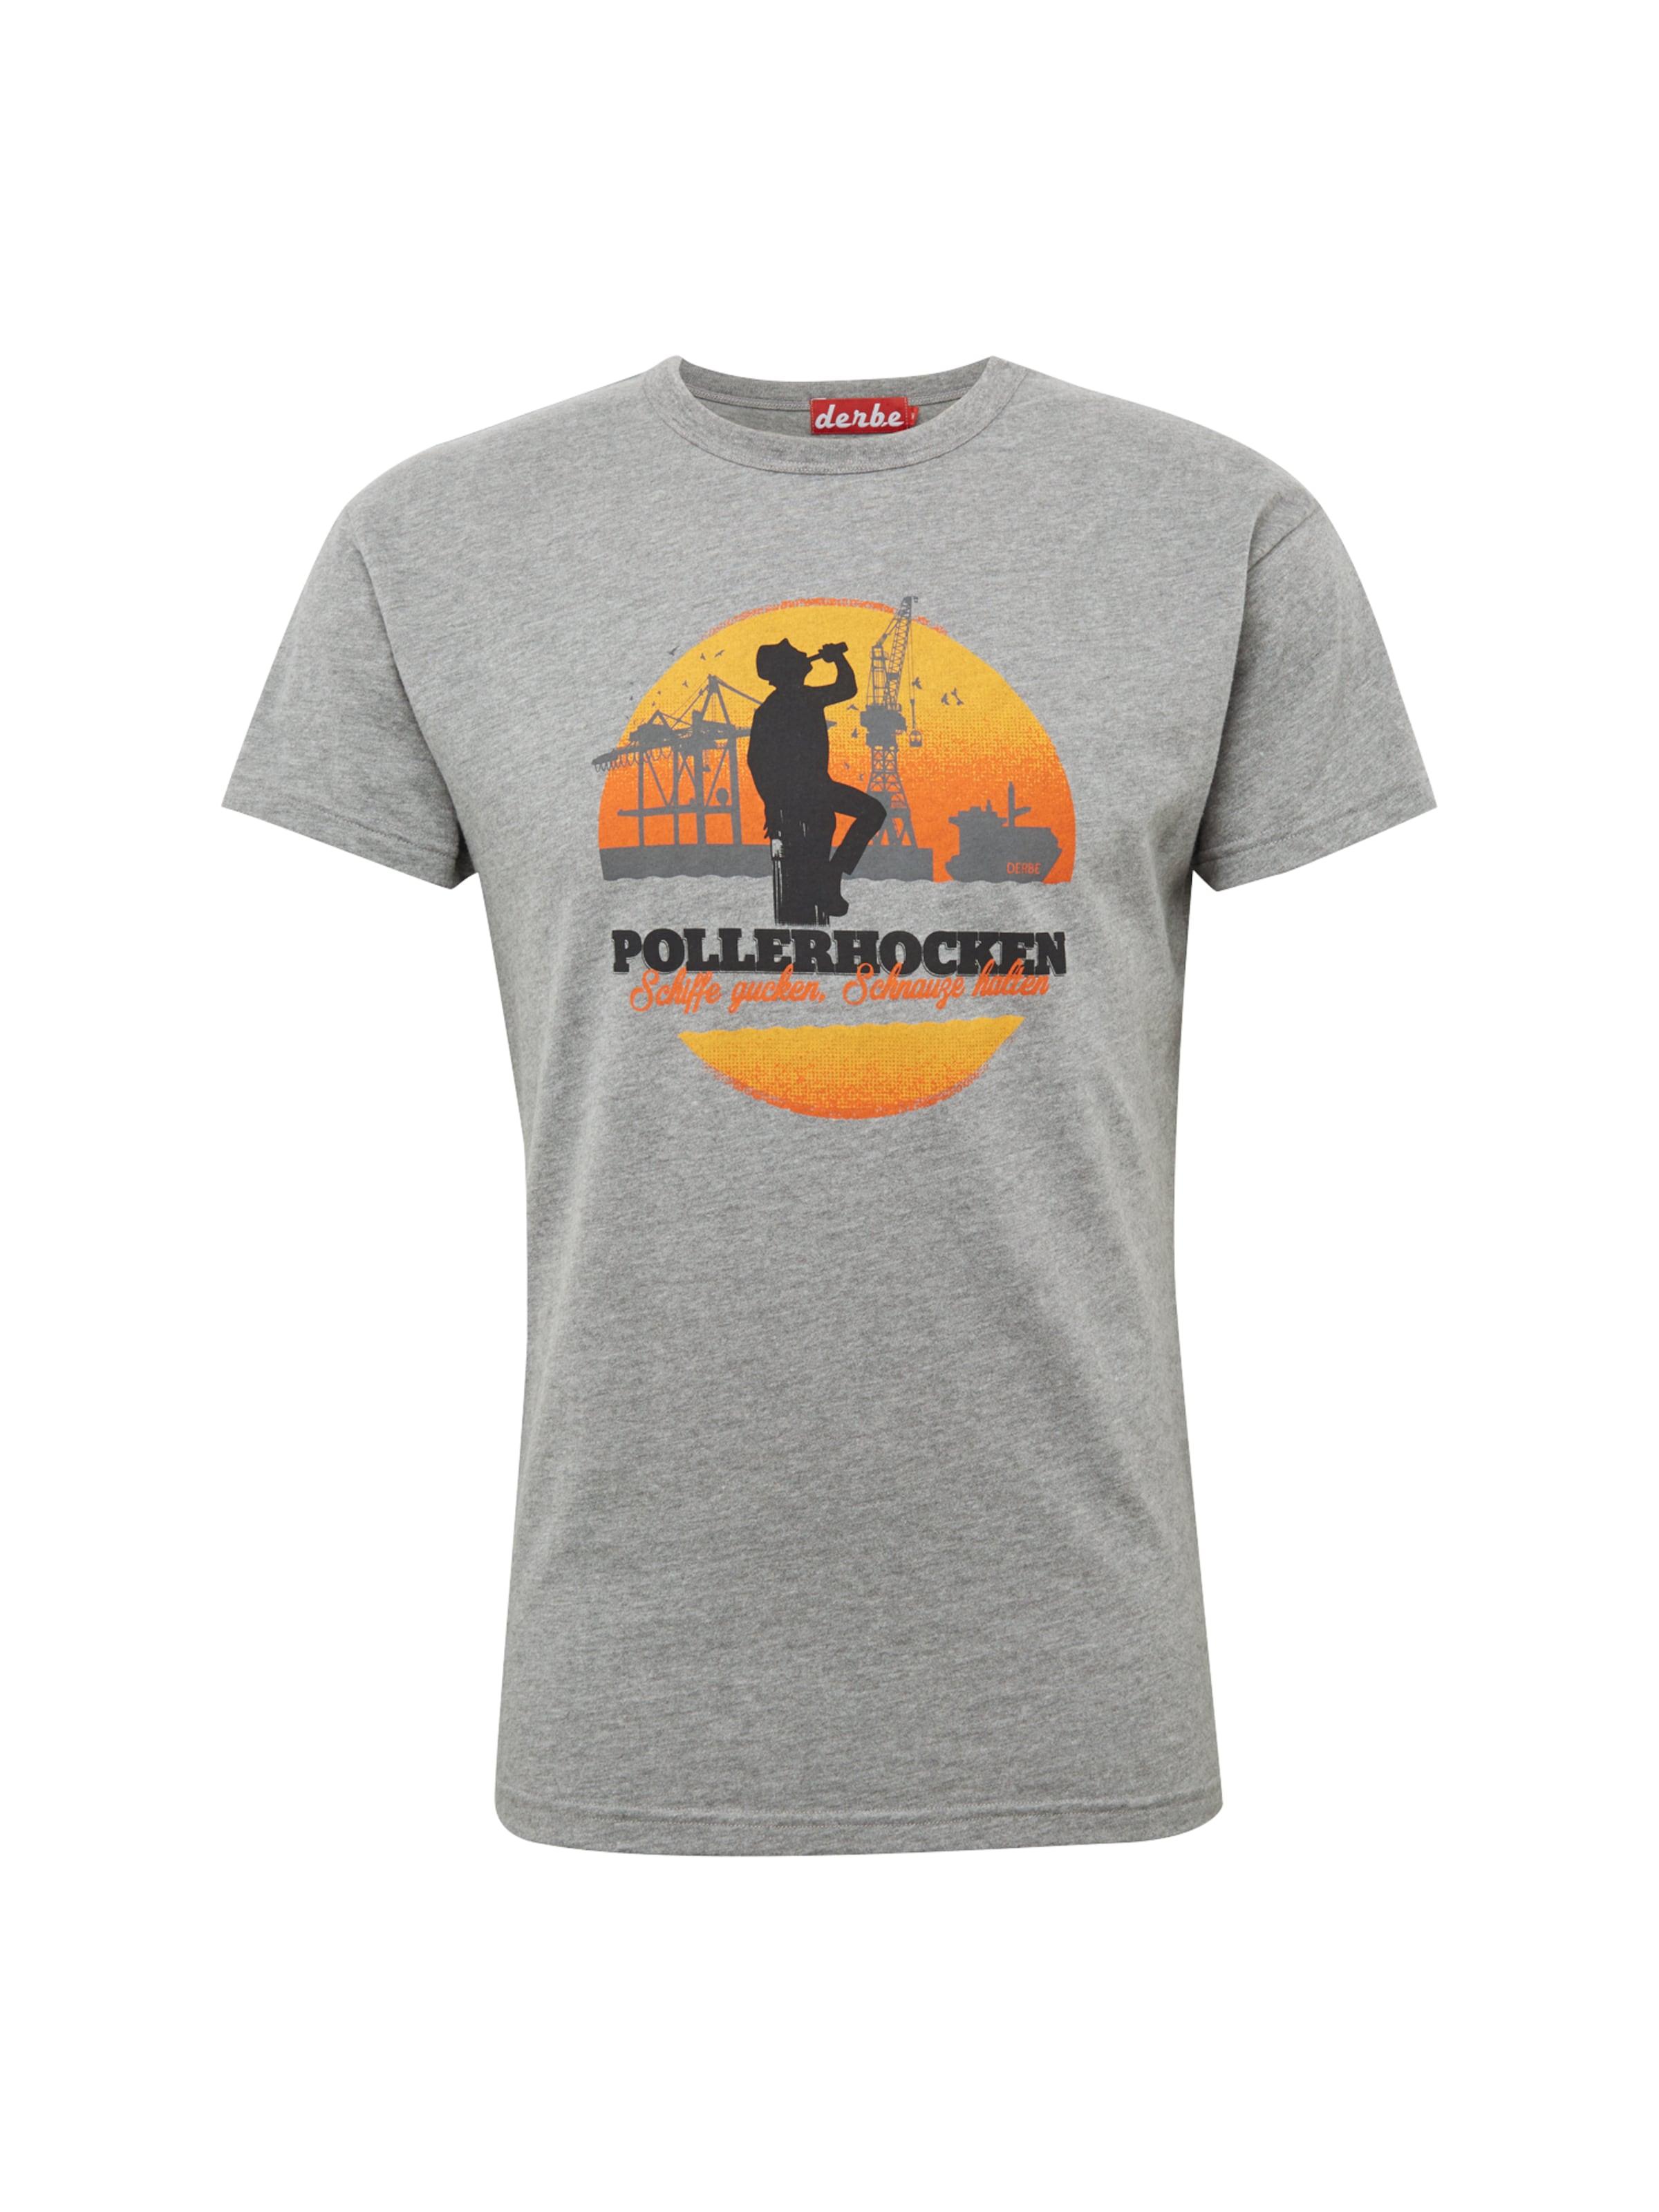 Gris shirt En Derbe T 'pollerhocken' 54Rj3AL